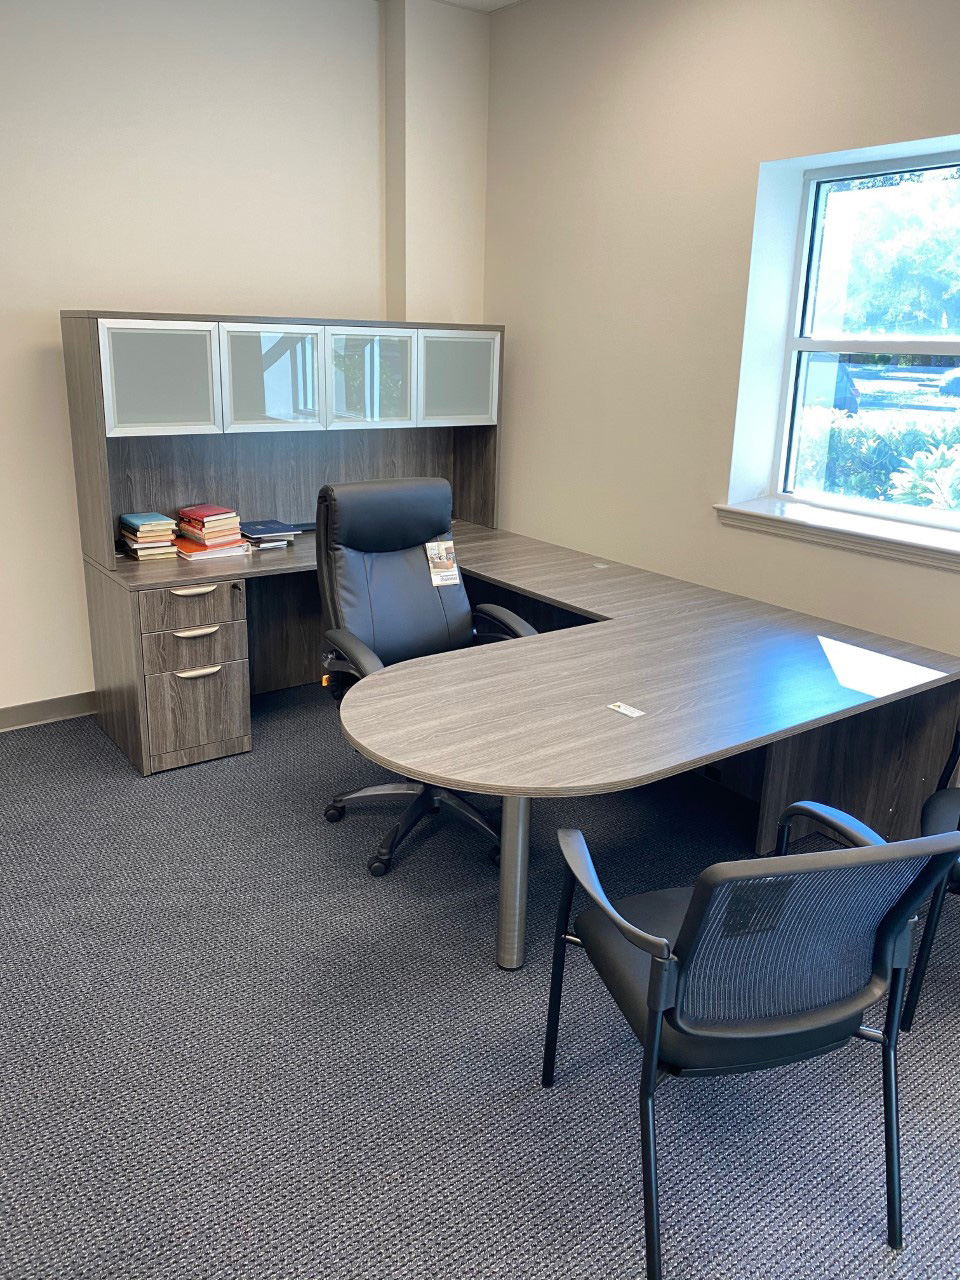 office-cubicle-furniture-suppliers-in-bradenton-florida-11-.jpg